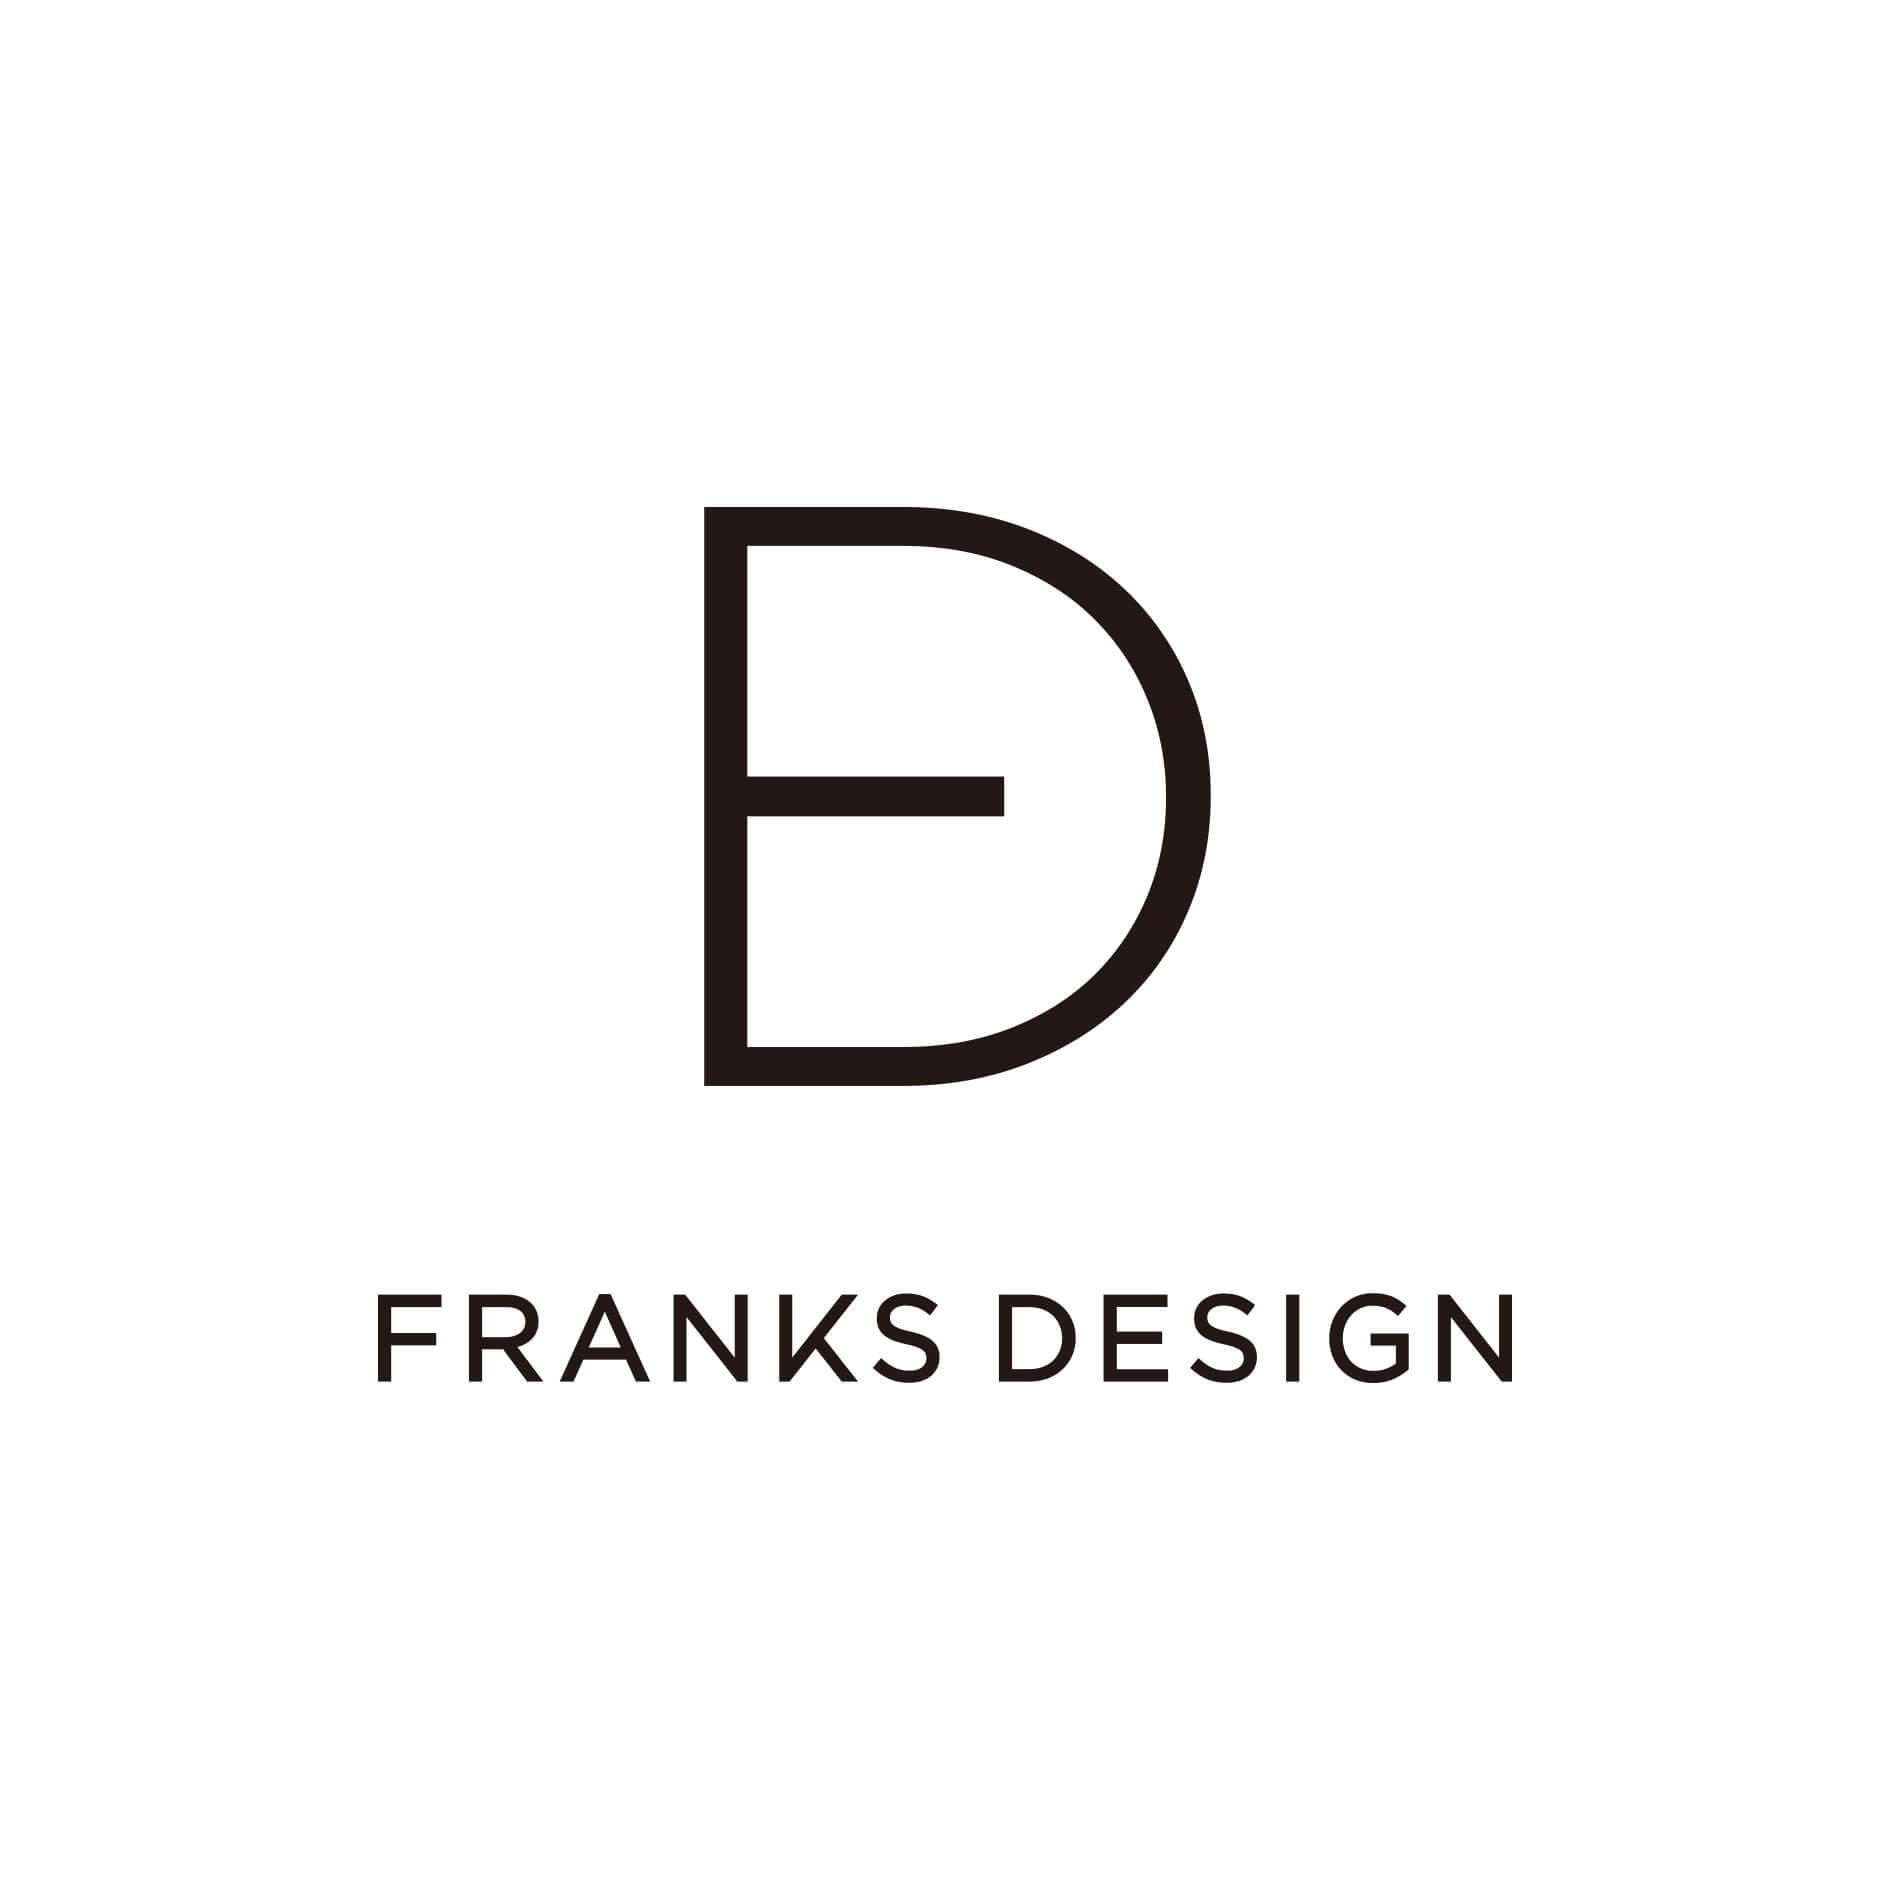 FRANKS DESIGN